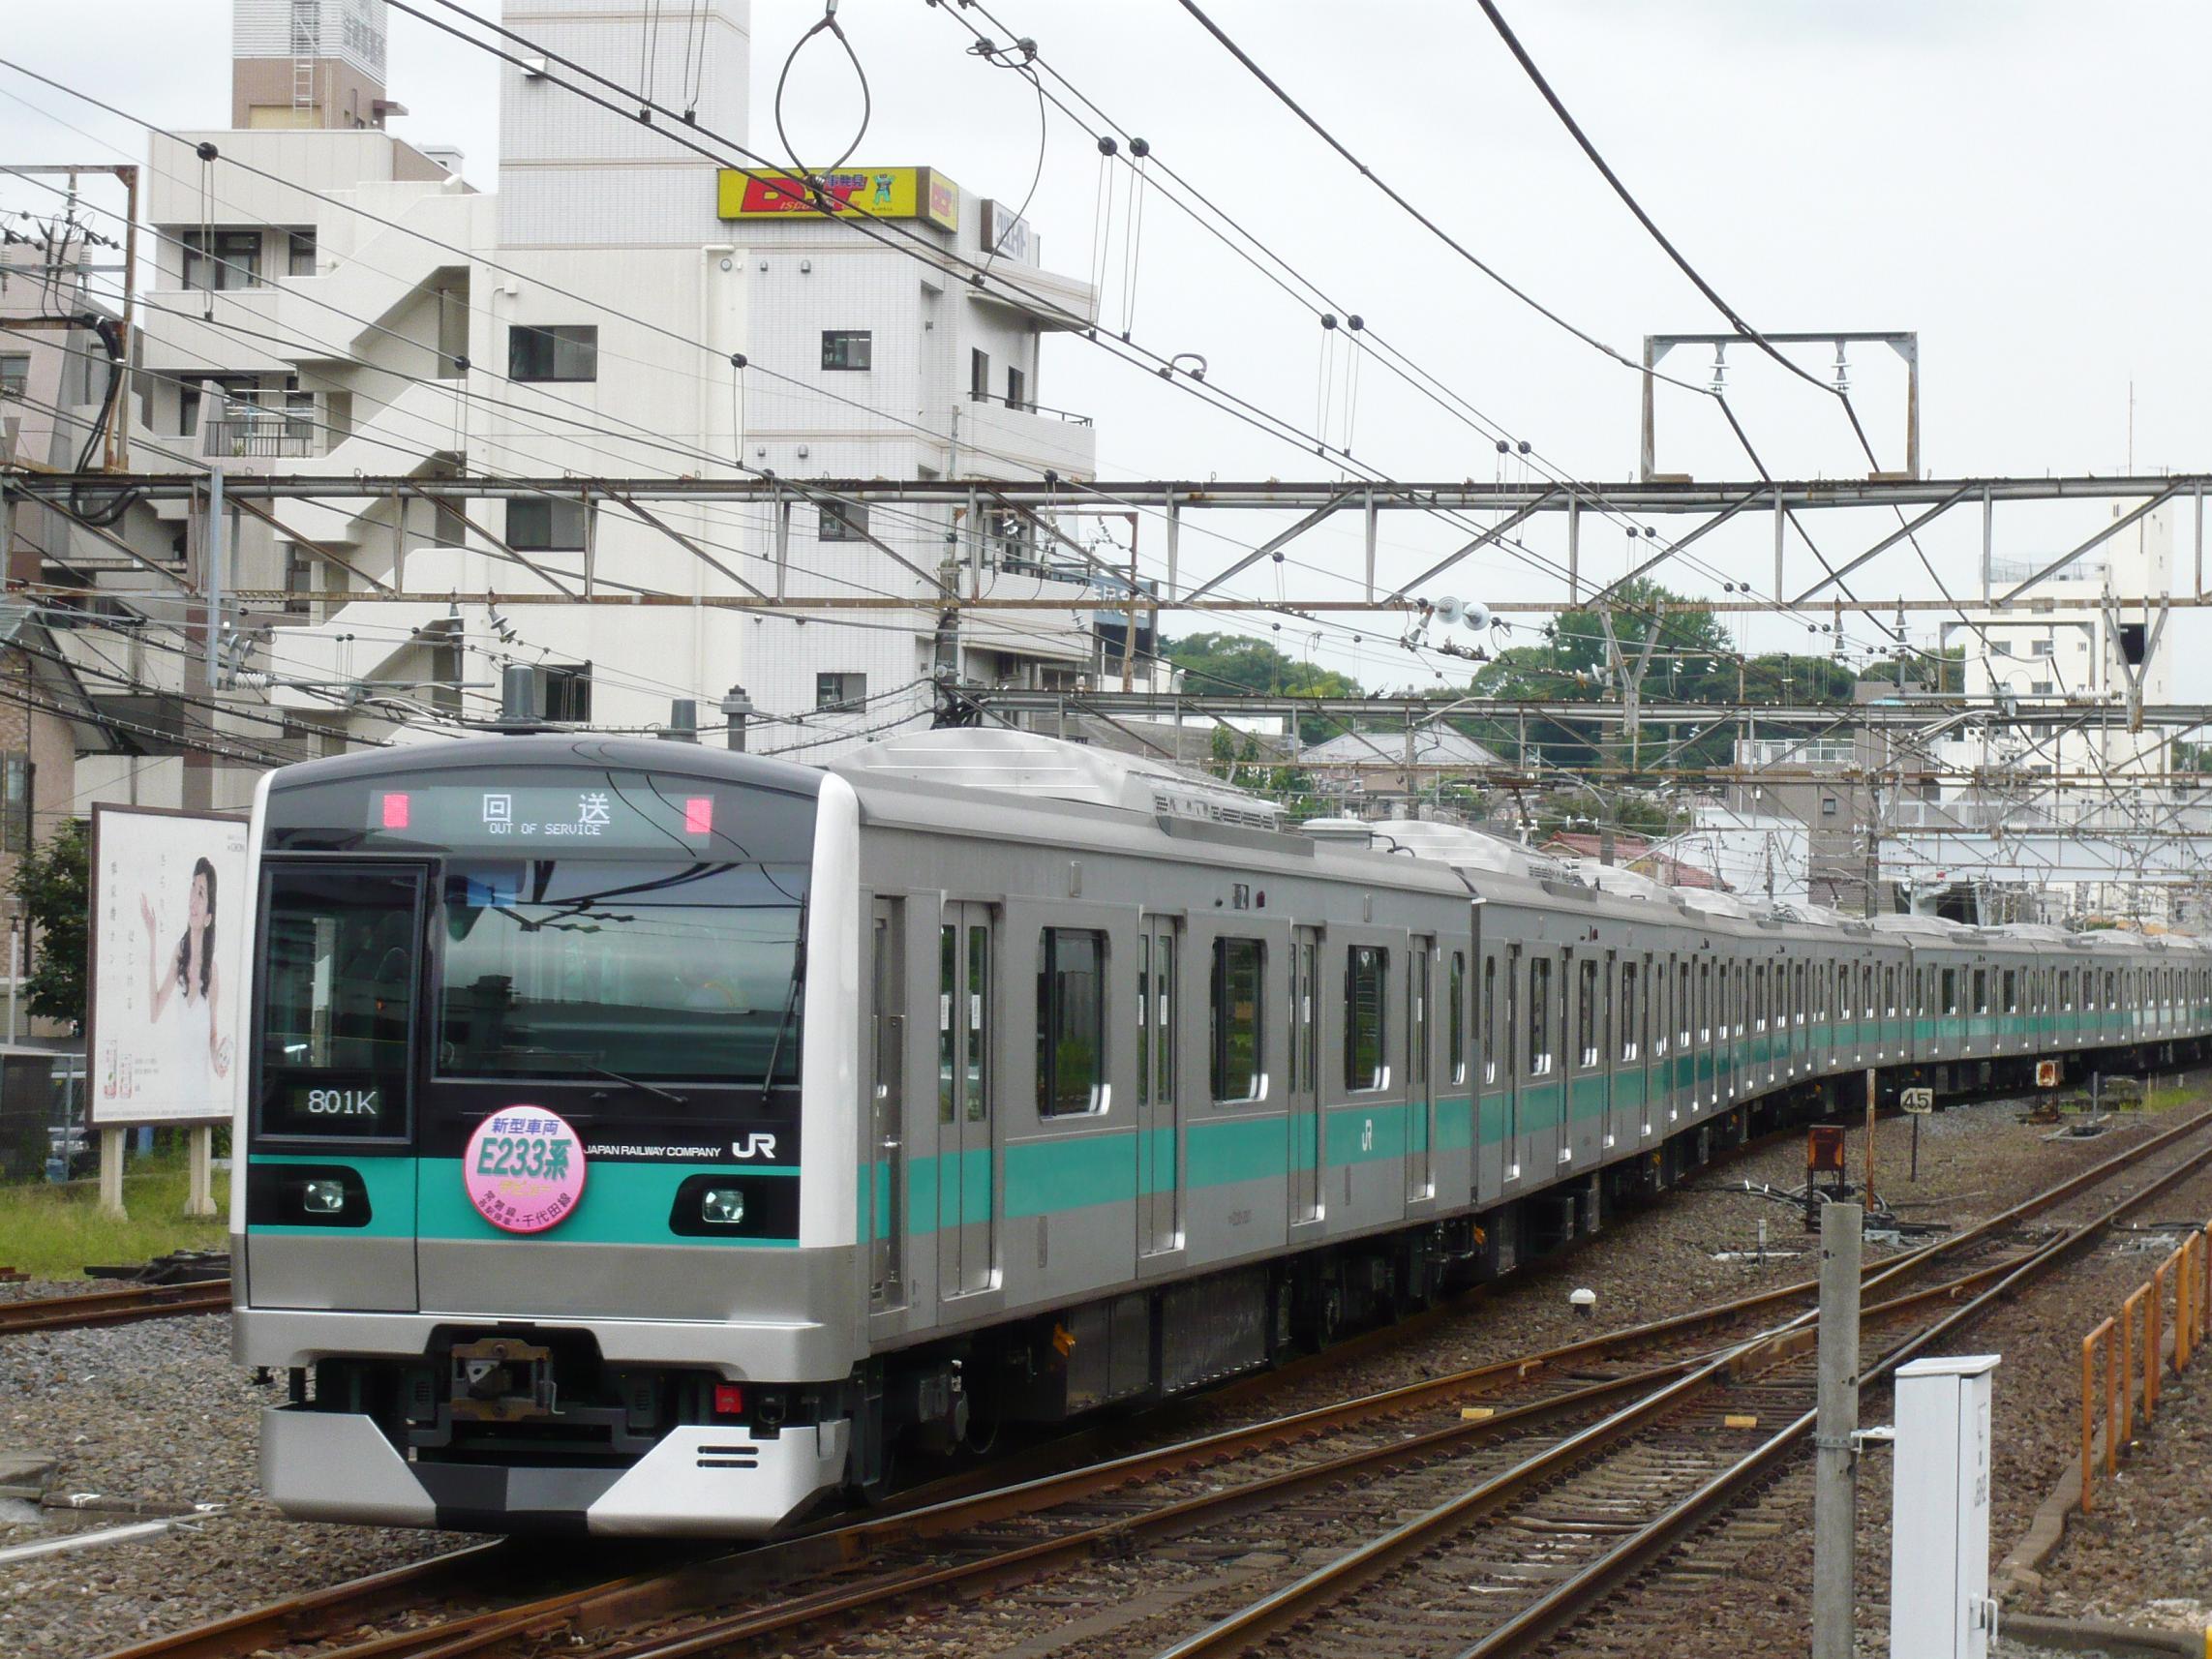 P1010722-2.JPG